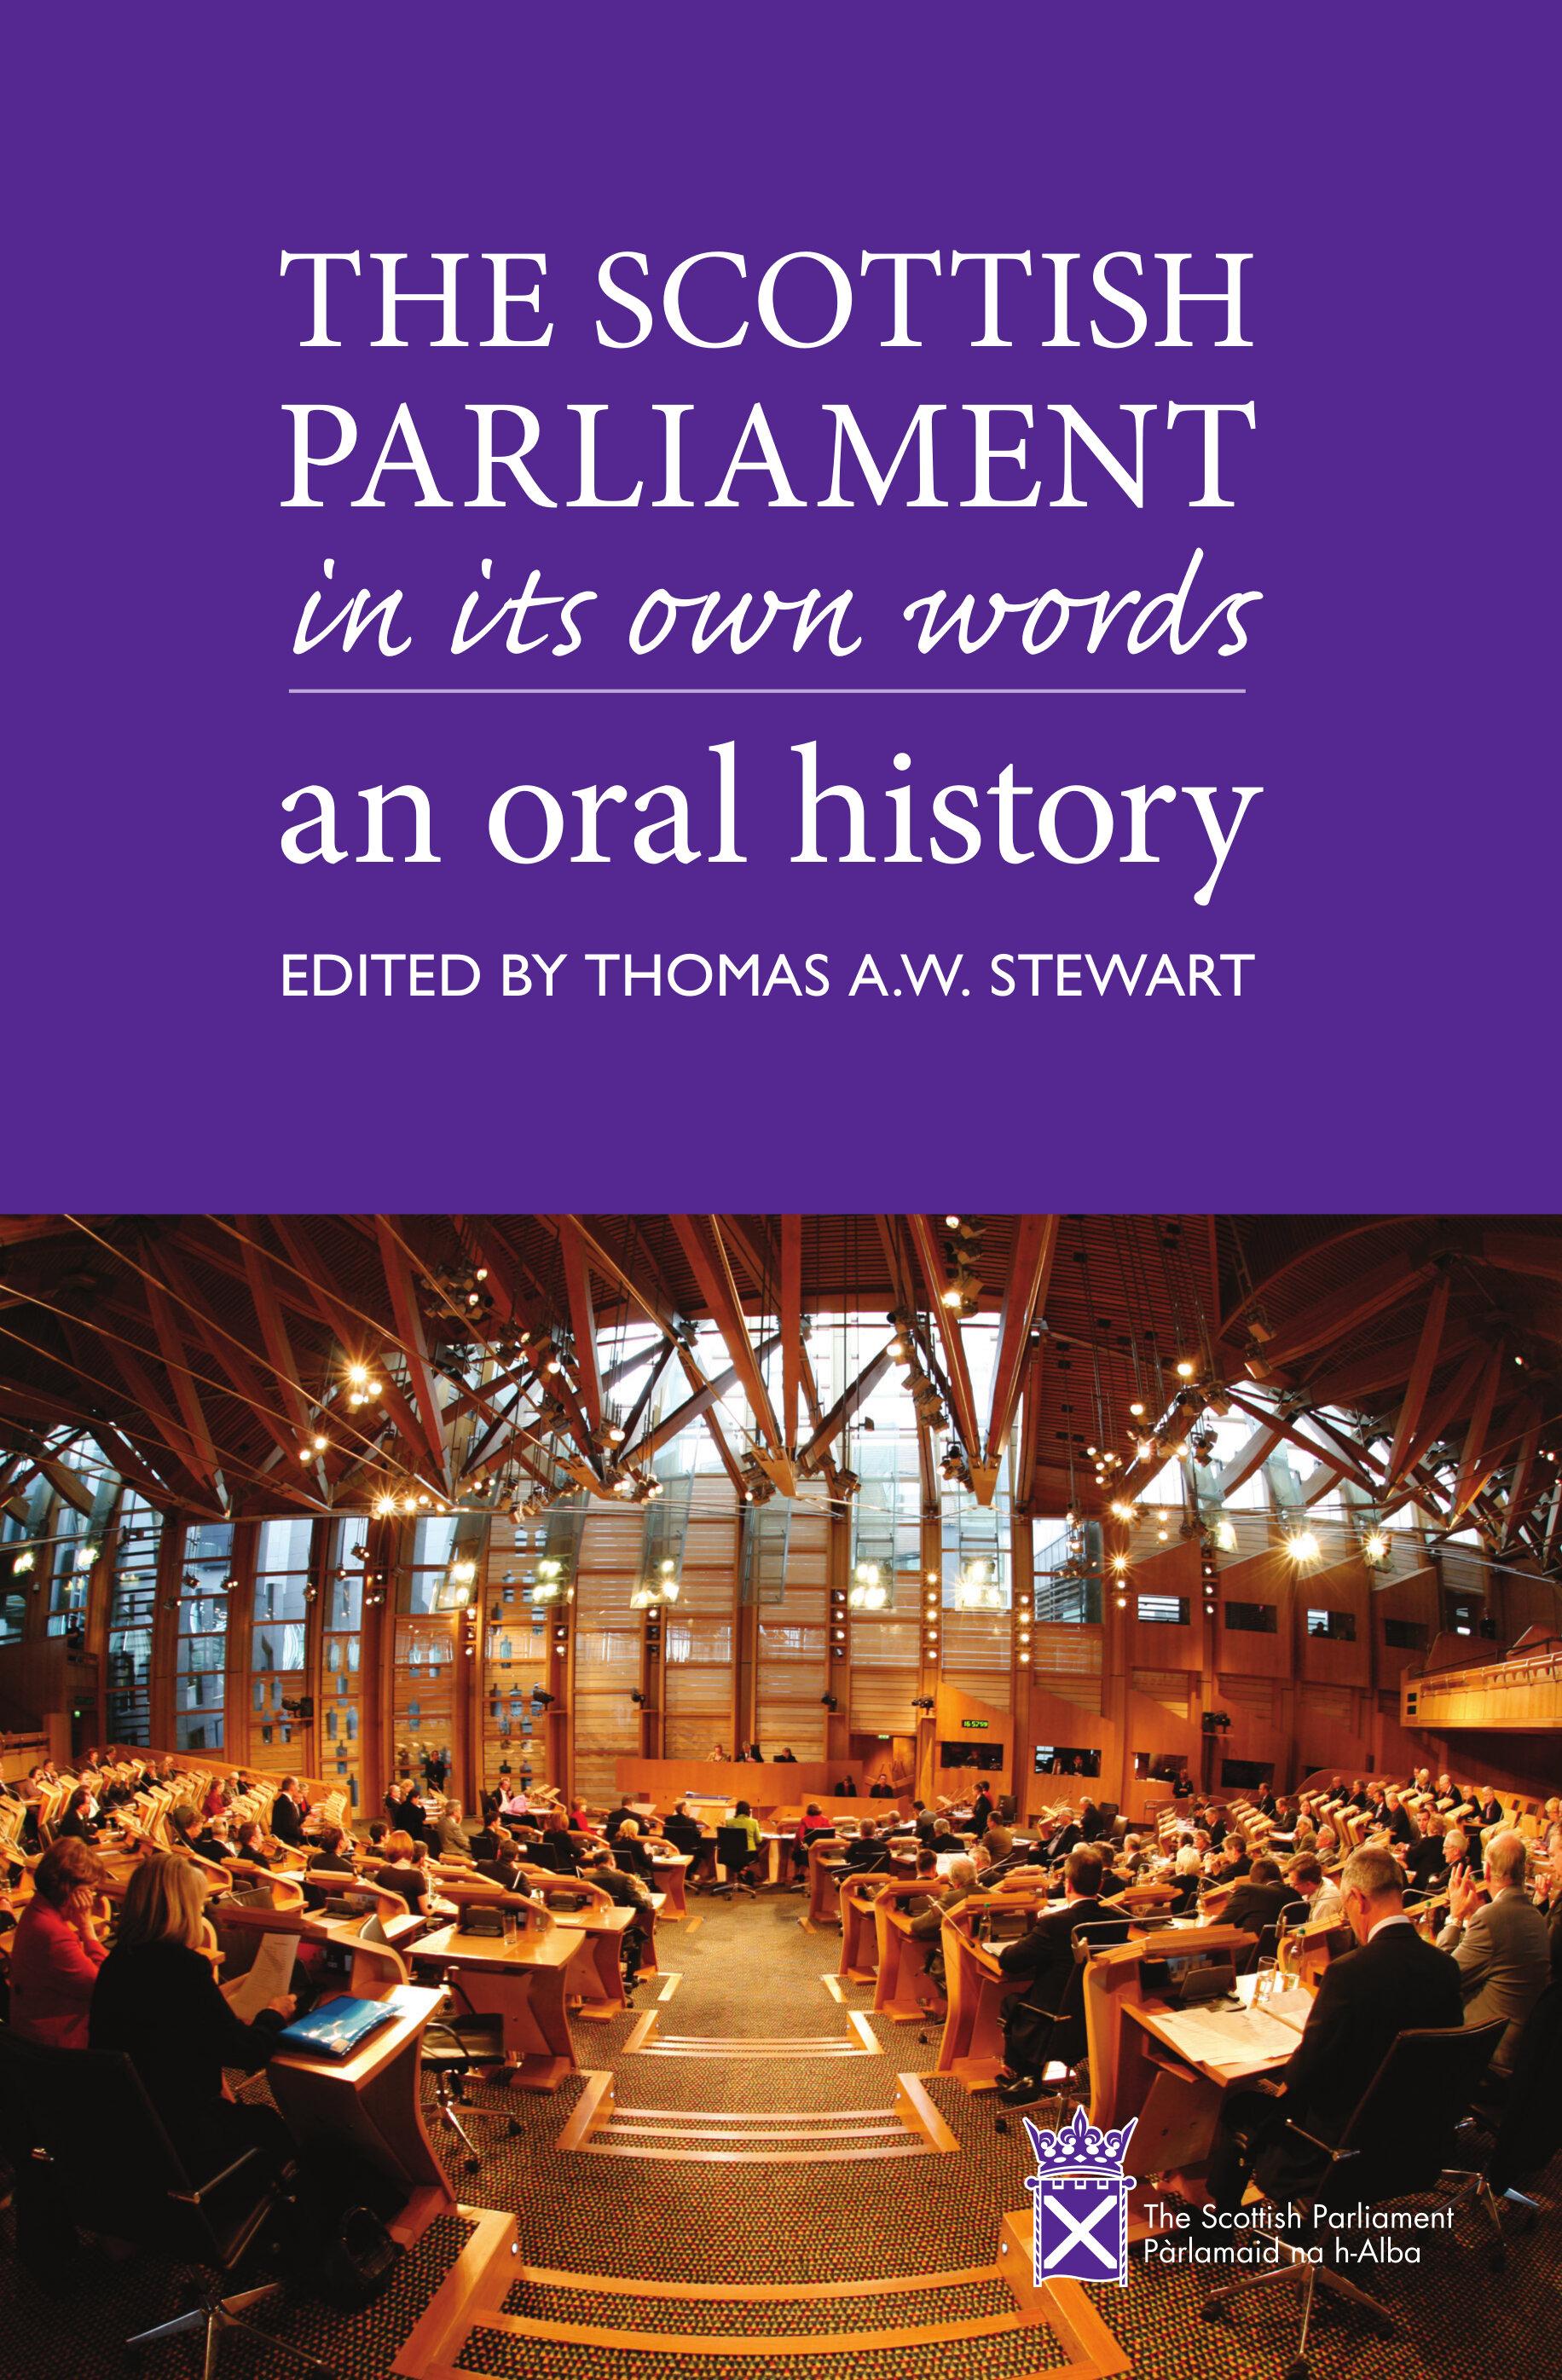 The Scottish Parliament in its Own Words Thomas Stewart 9781912147977 Luath Press.jpg